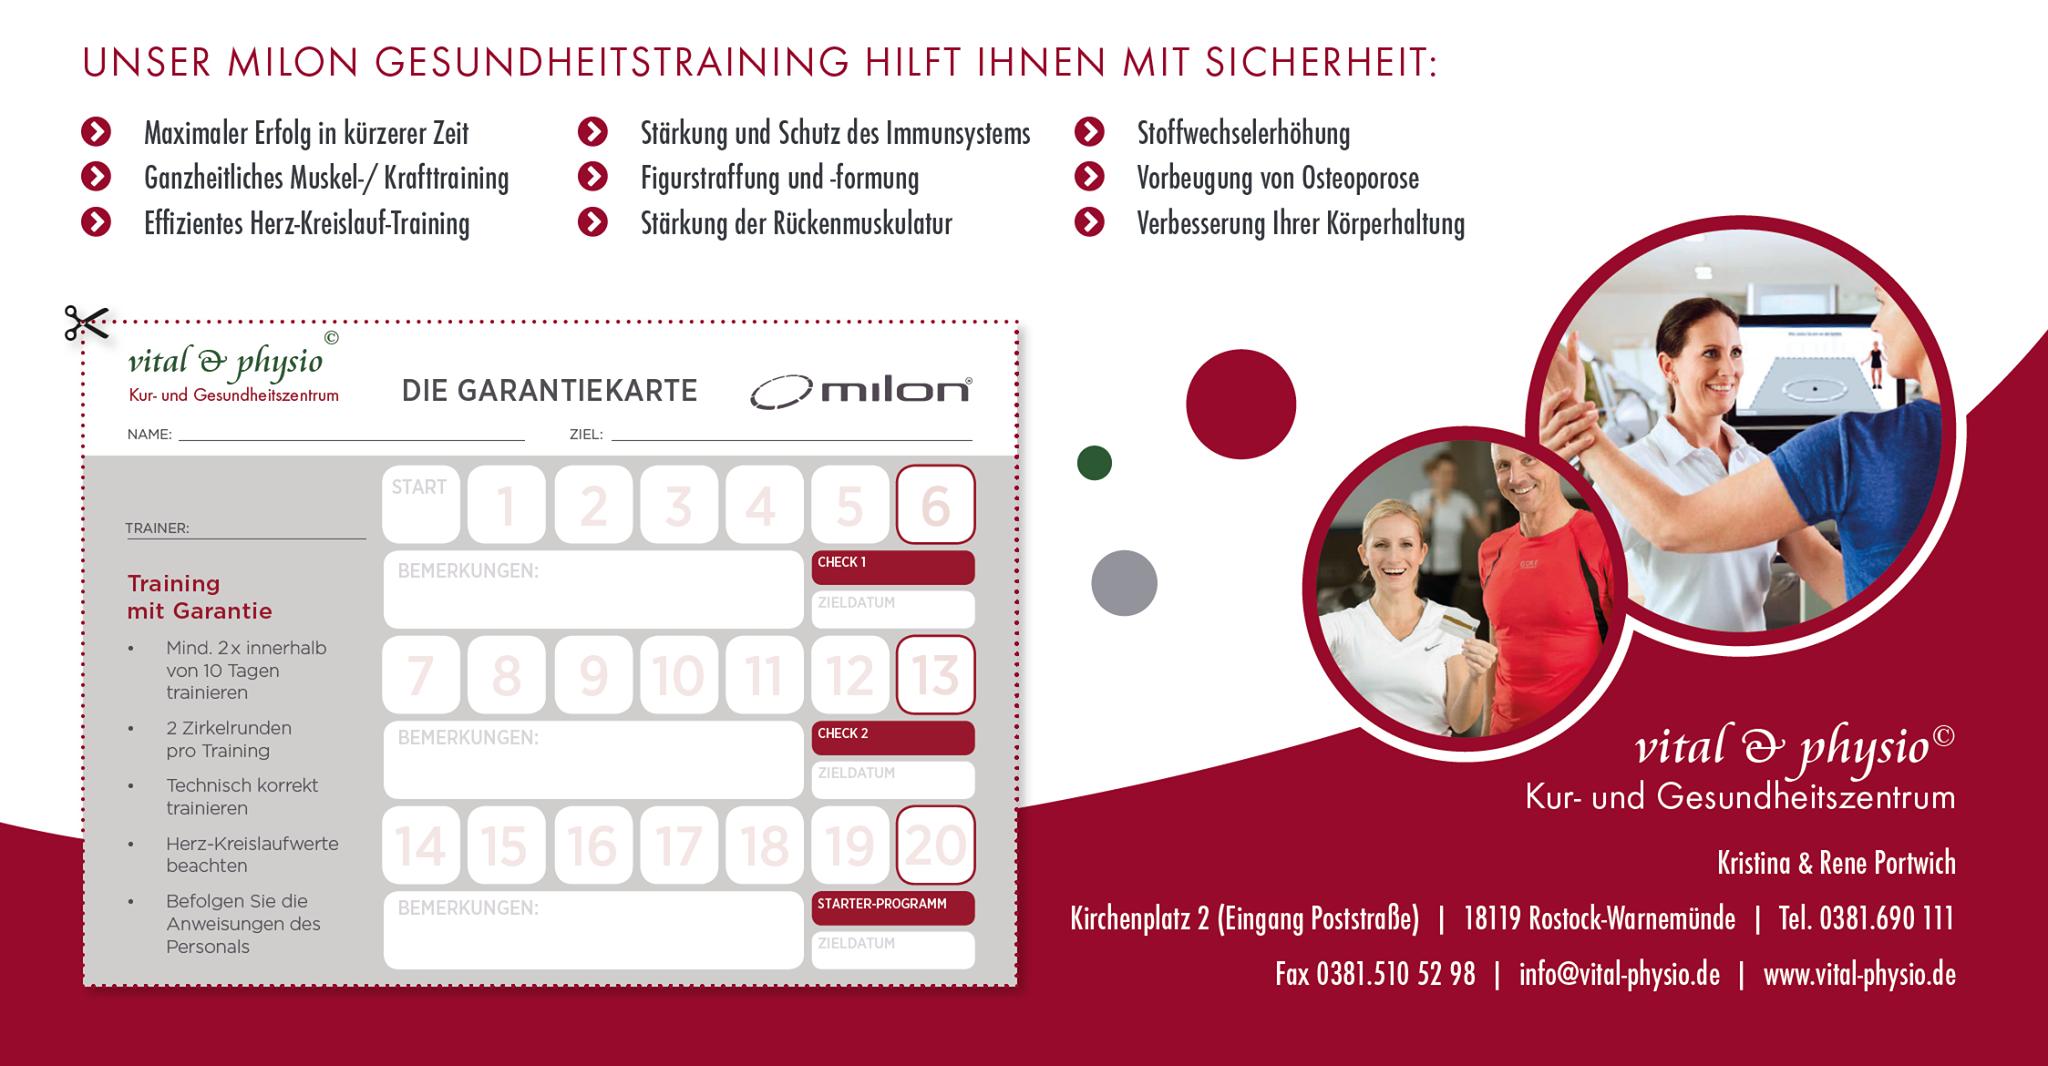 vital & physio GmbH